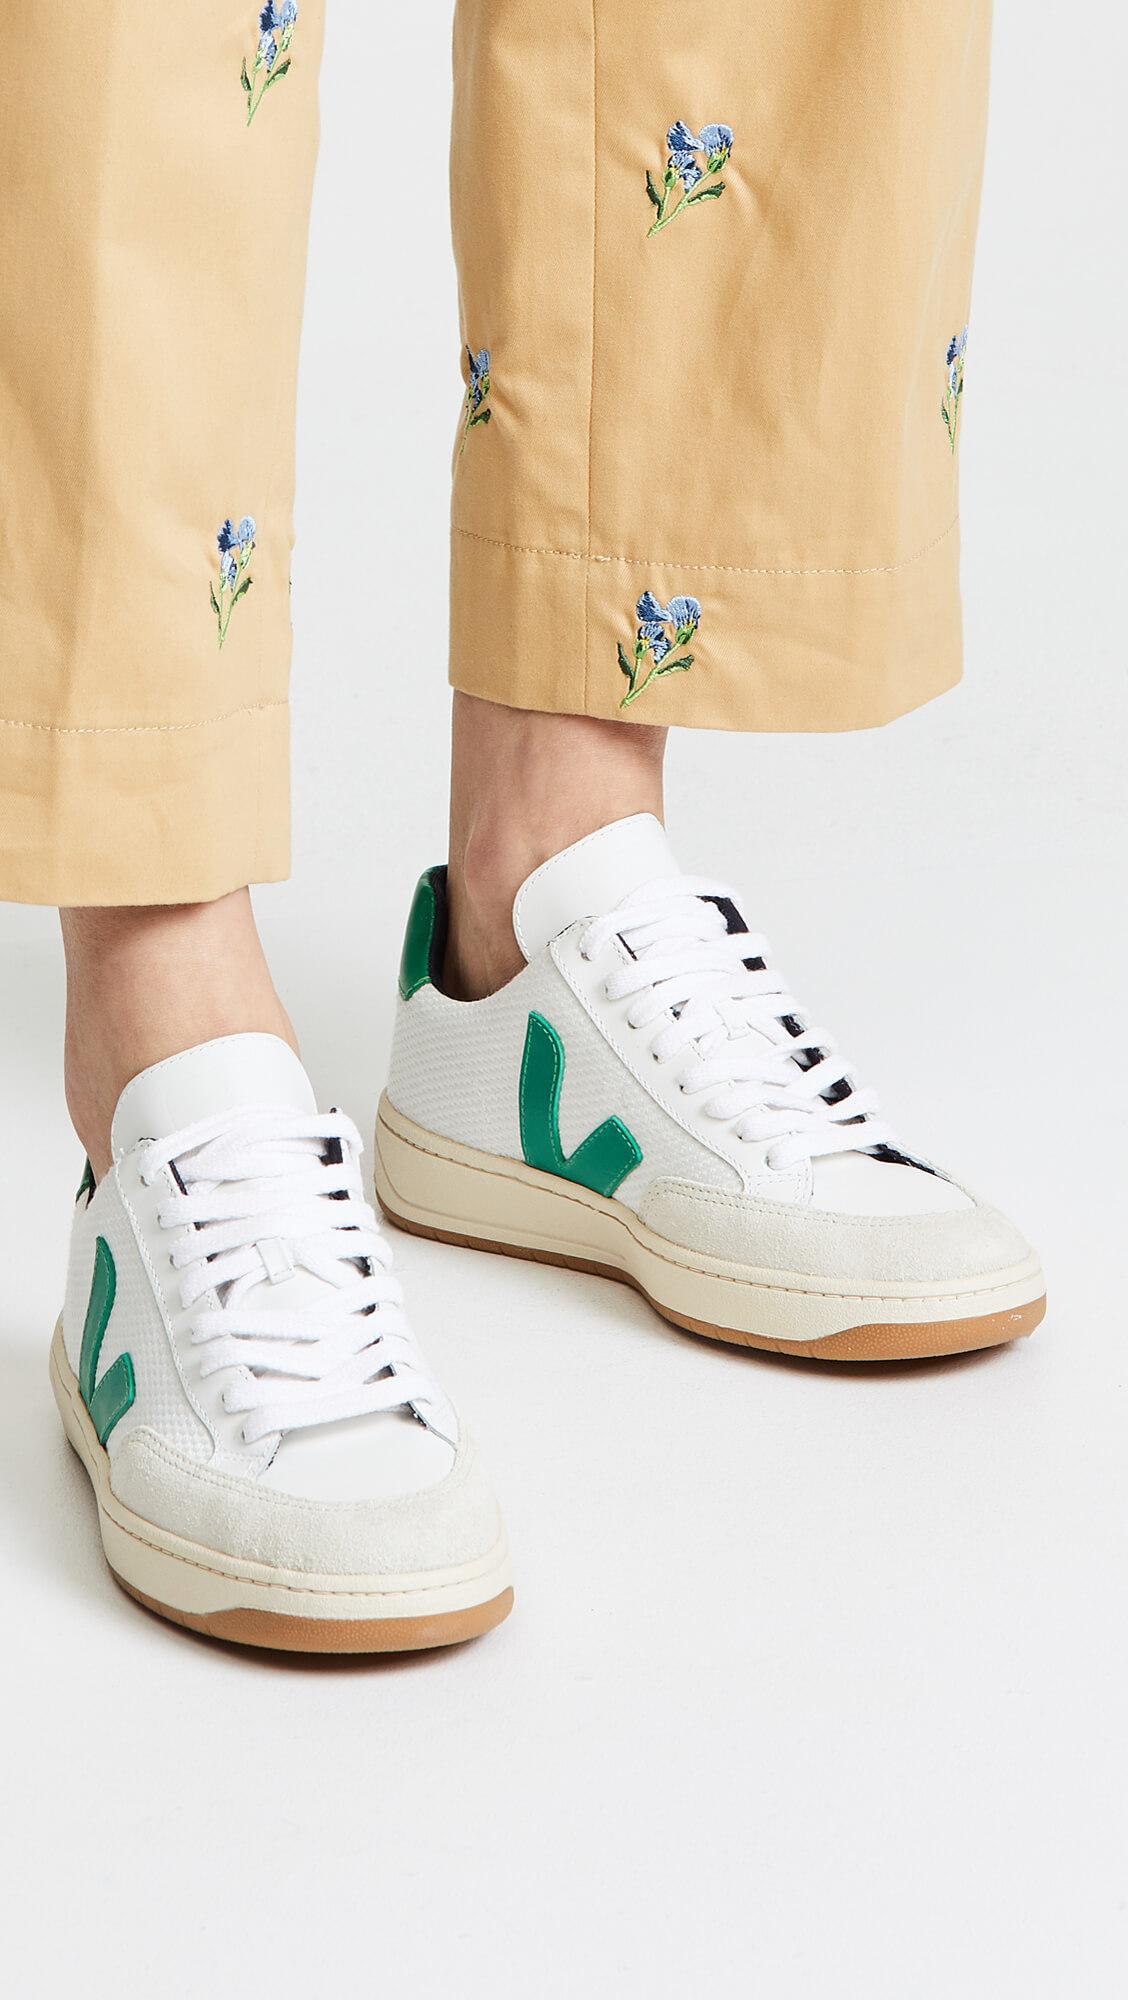 madewell-shoes-veja-v-12-sneakers.jpg